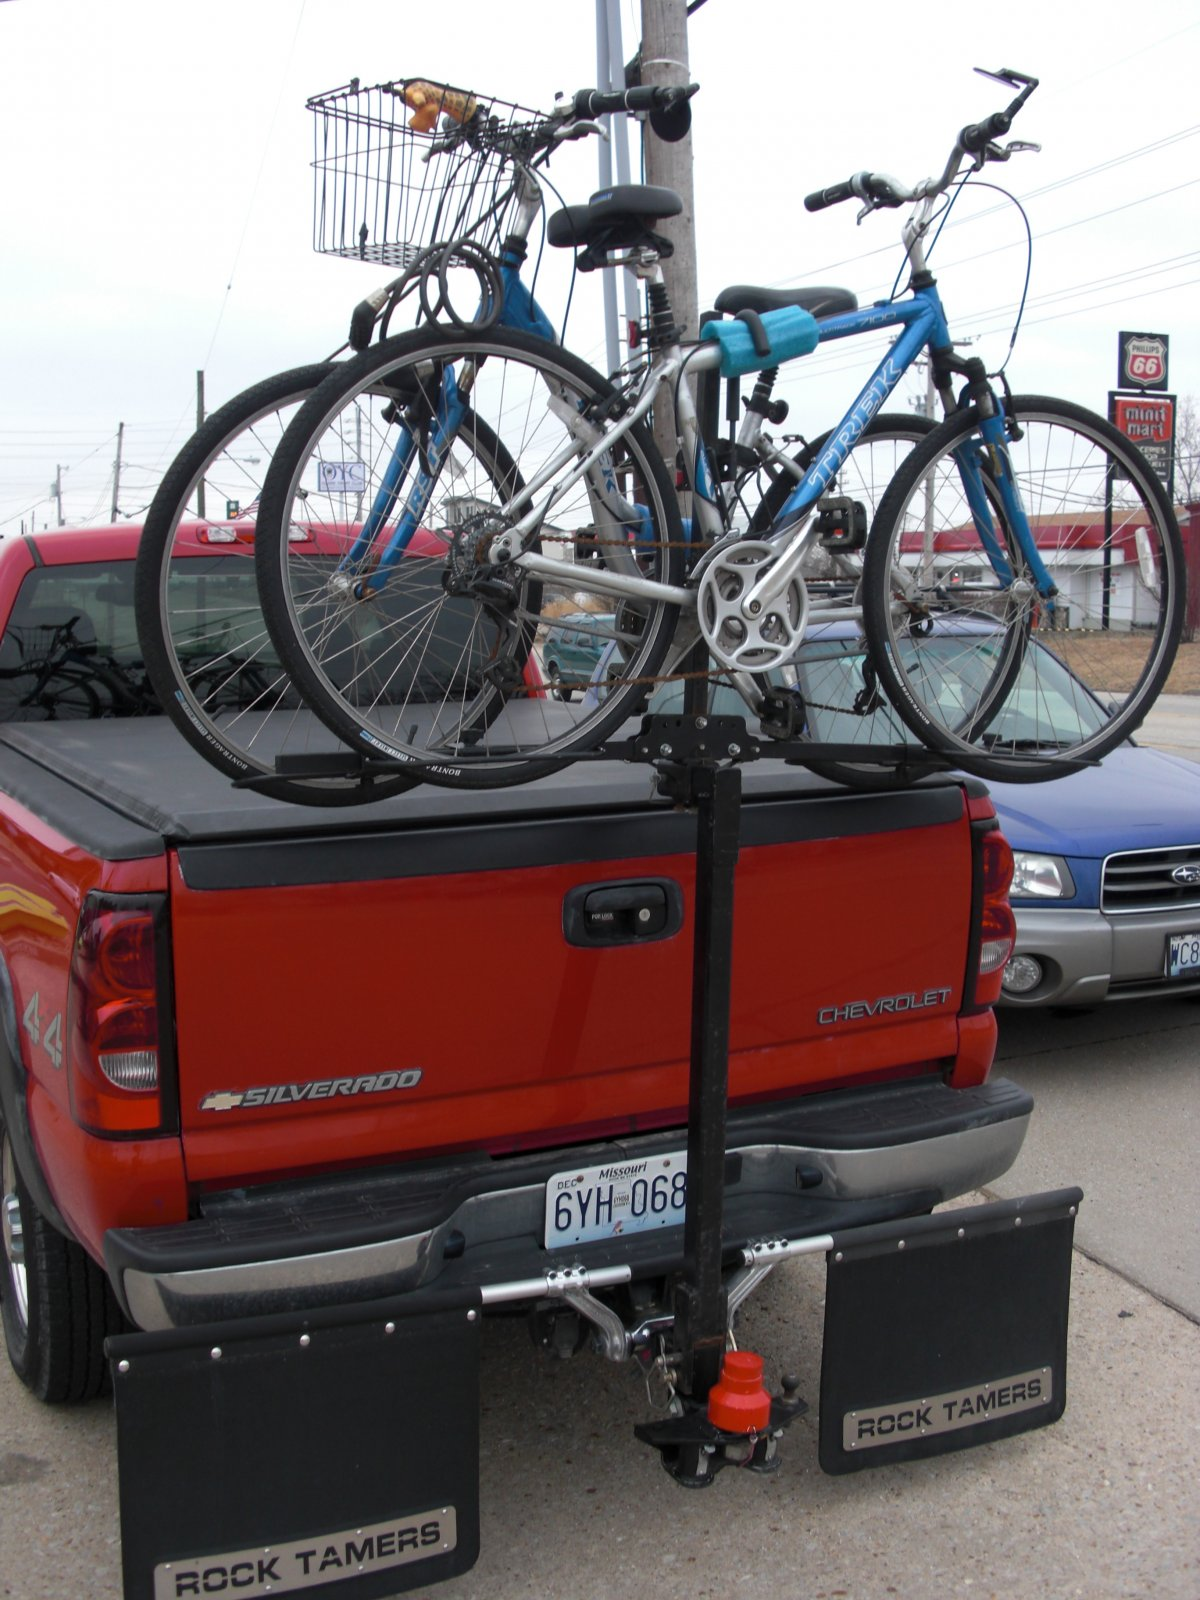 Click image for larger version  Name:Bike Rack.jpg Views:73 Size:288.2 KB ID:97260